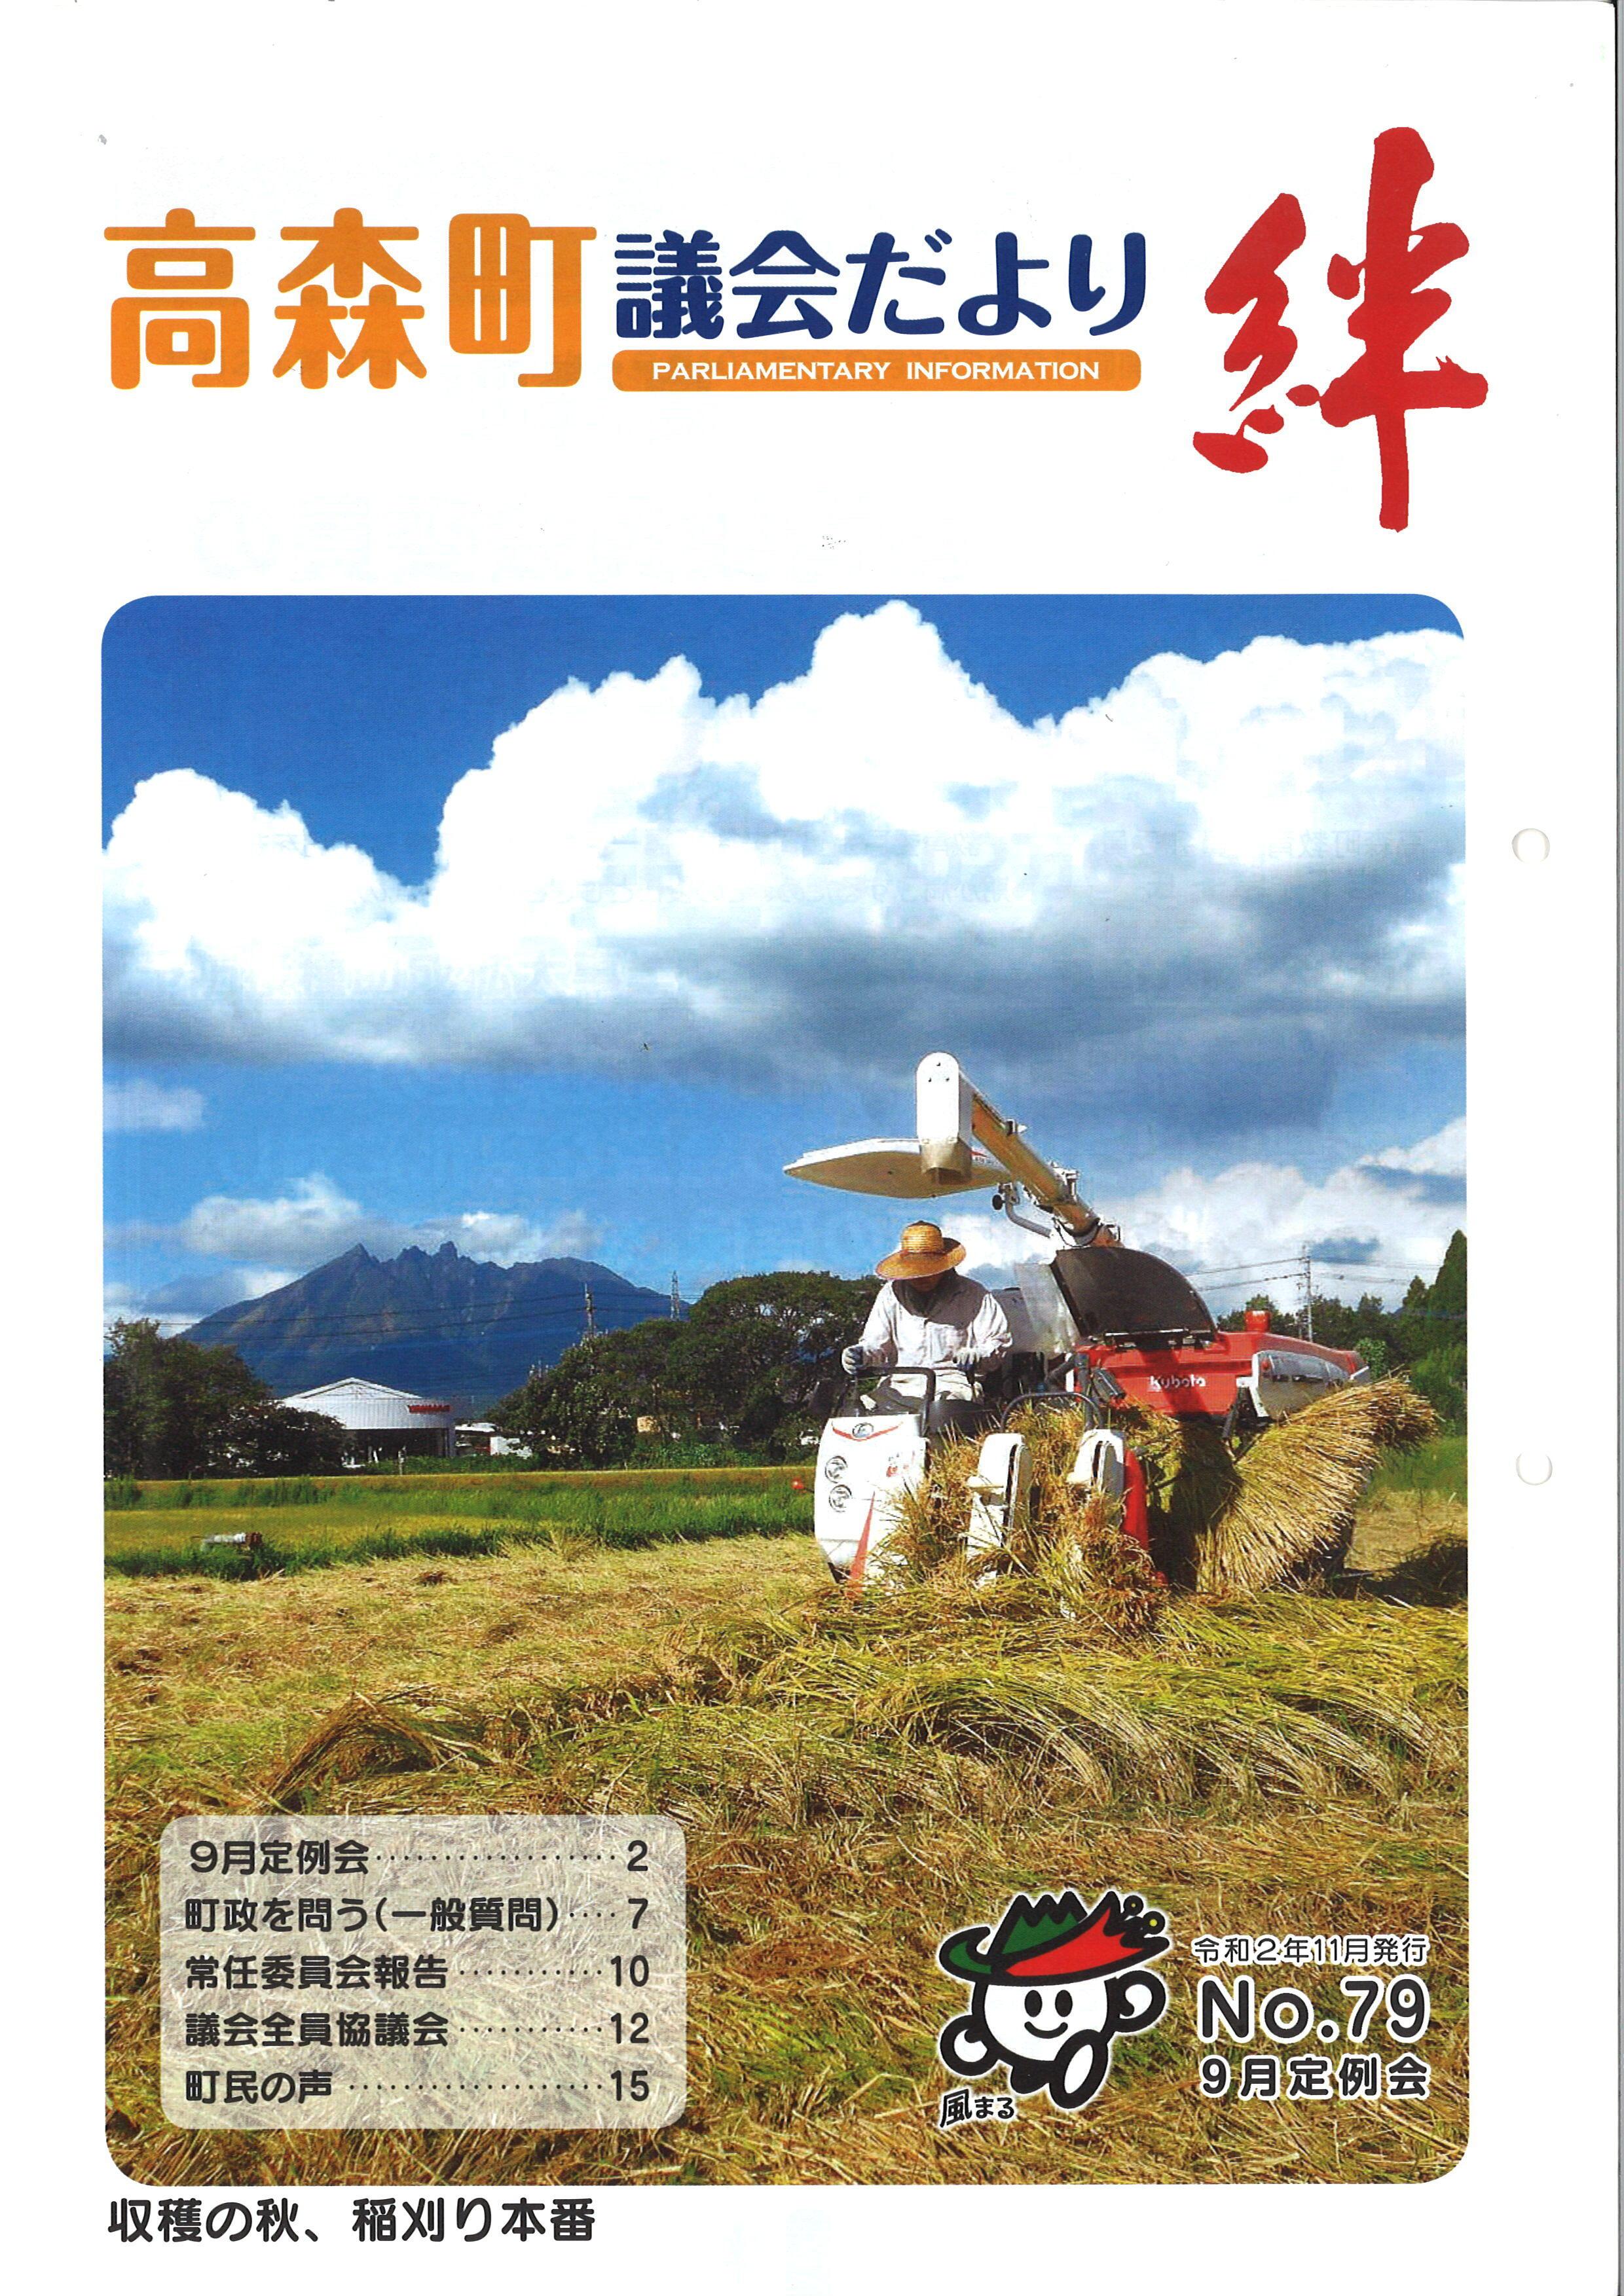 http://www.town.takamori.kumamoto.jp/chosha/somu/upload/1b7249b0c8c0474eea187c4a39057e754dd2ac1c.jpg